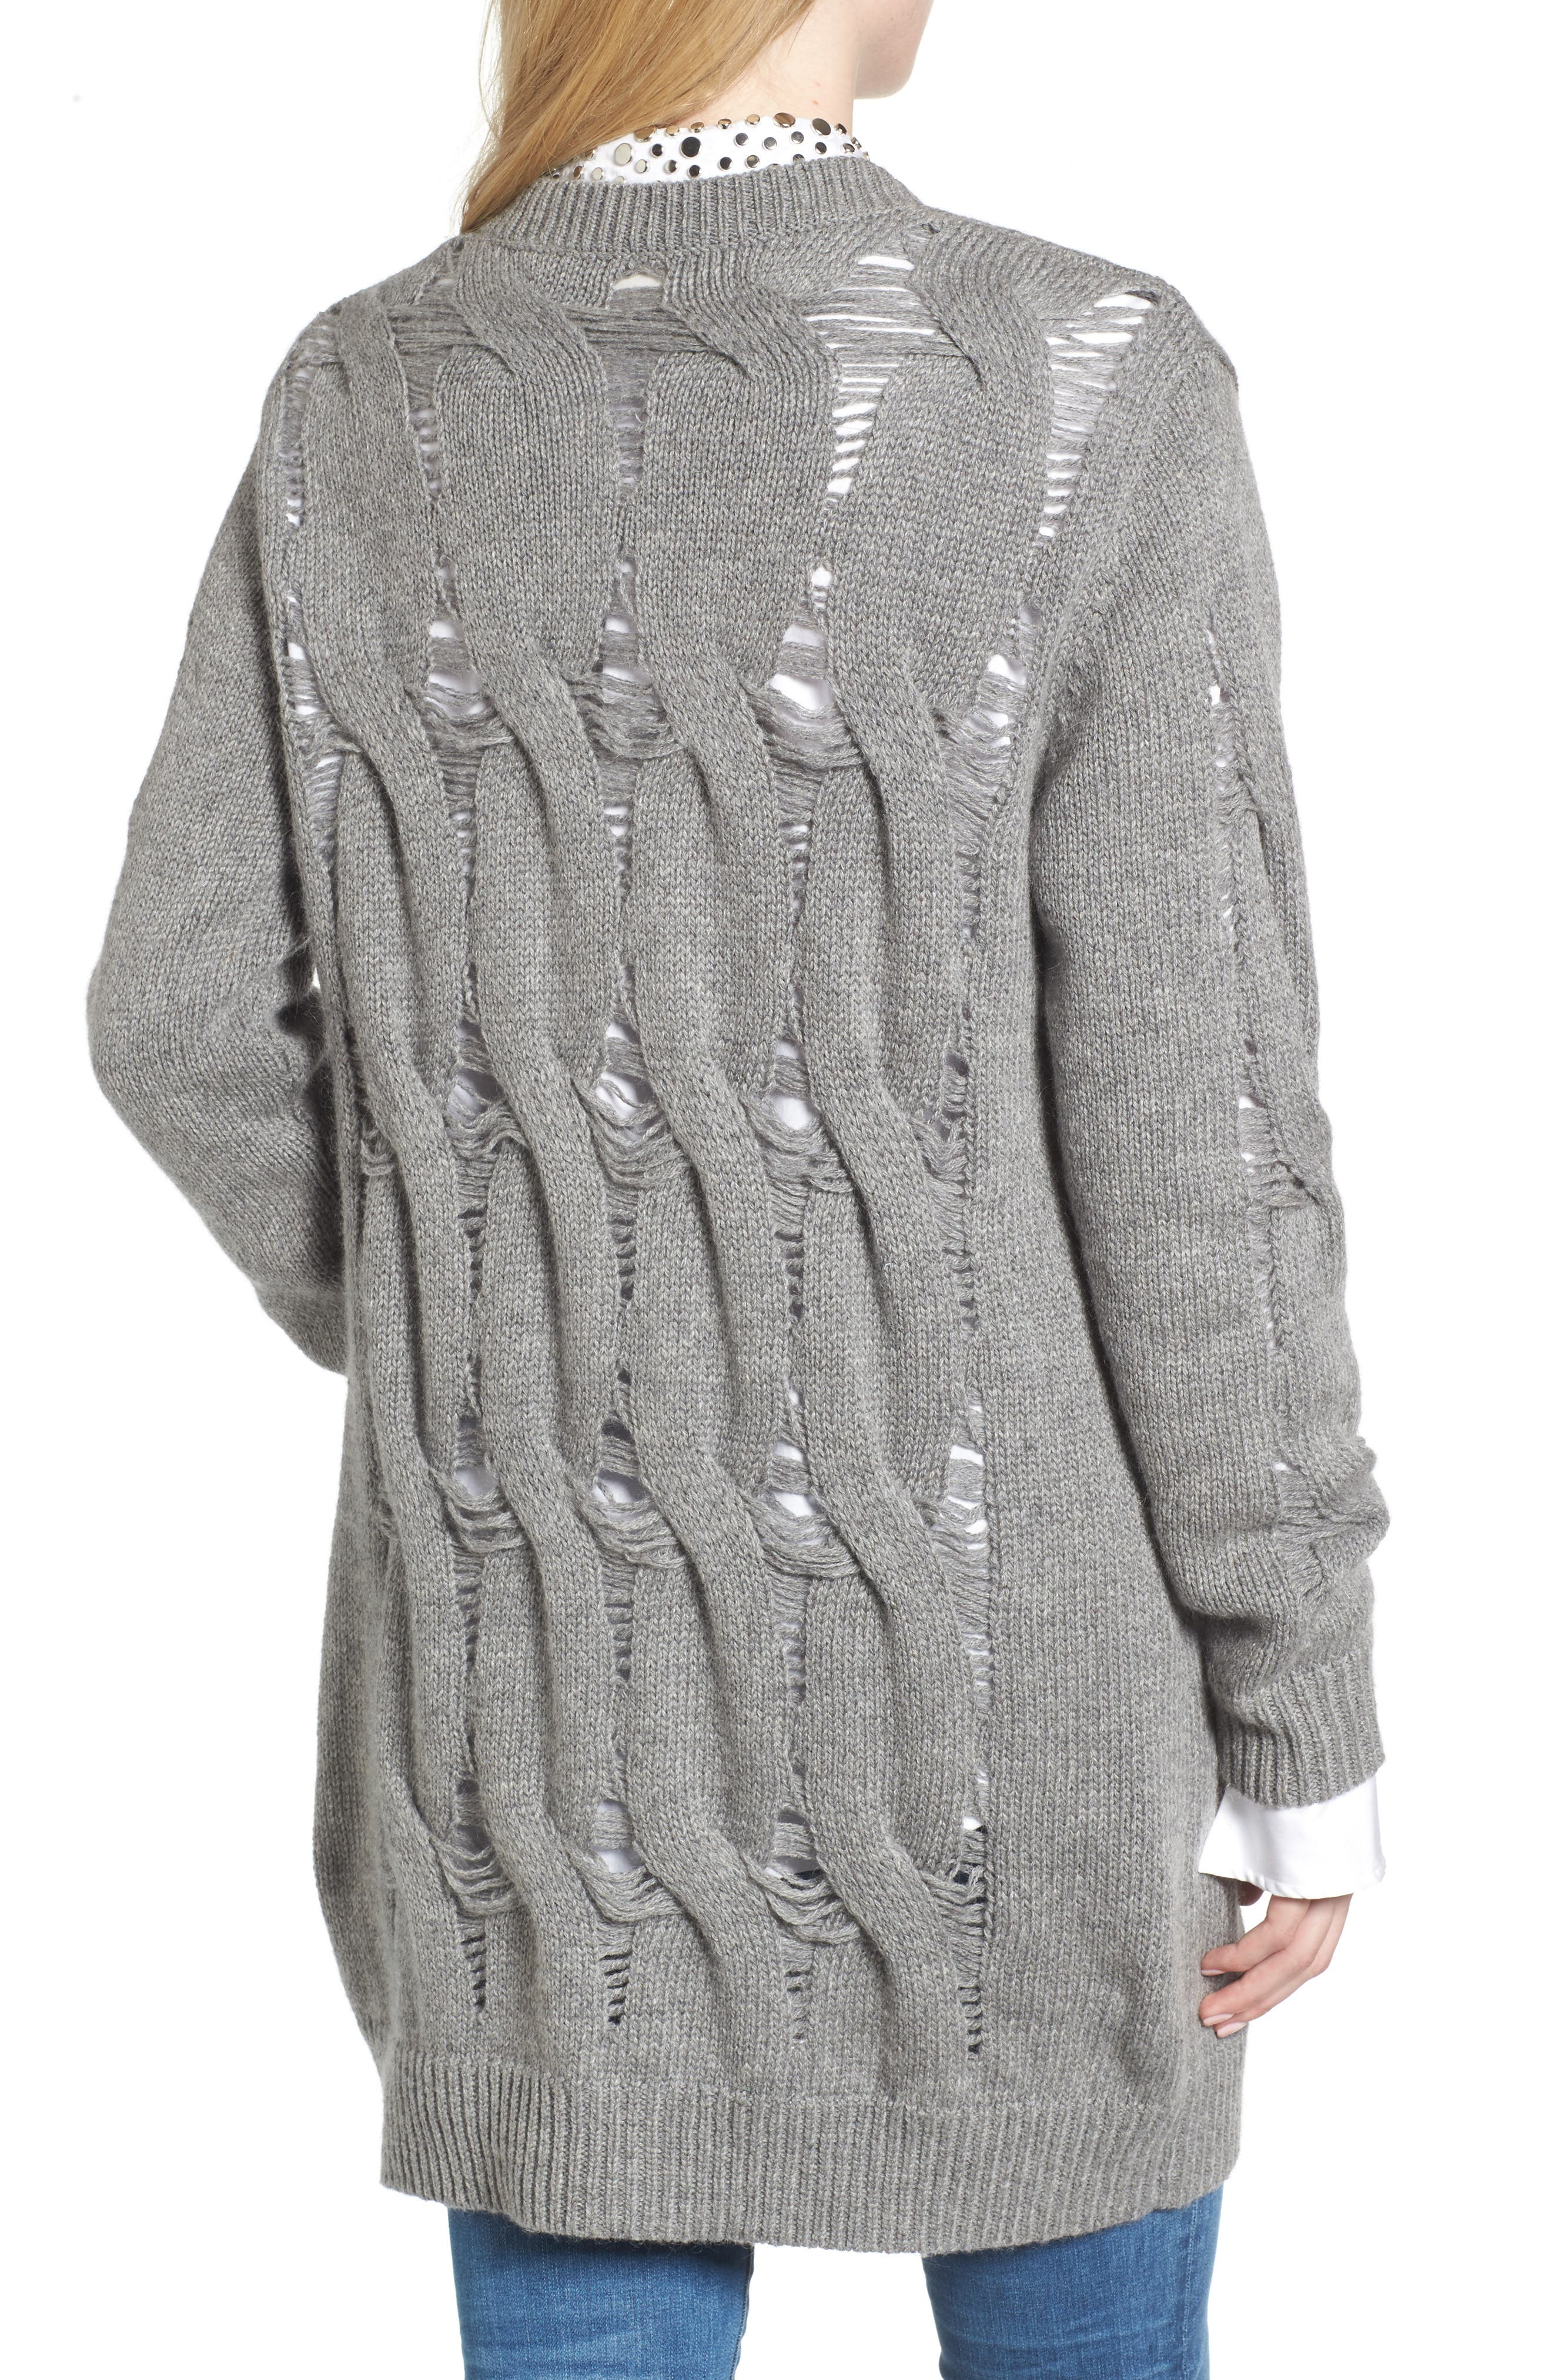 Sandrine Longline Cardigan Sweater,                             Alternate thumbnail 2, color,                             Pebble Grey